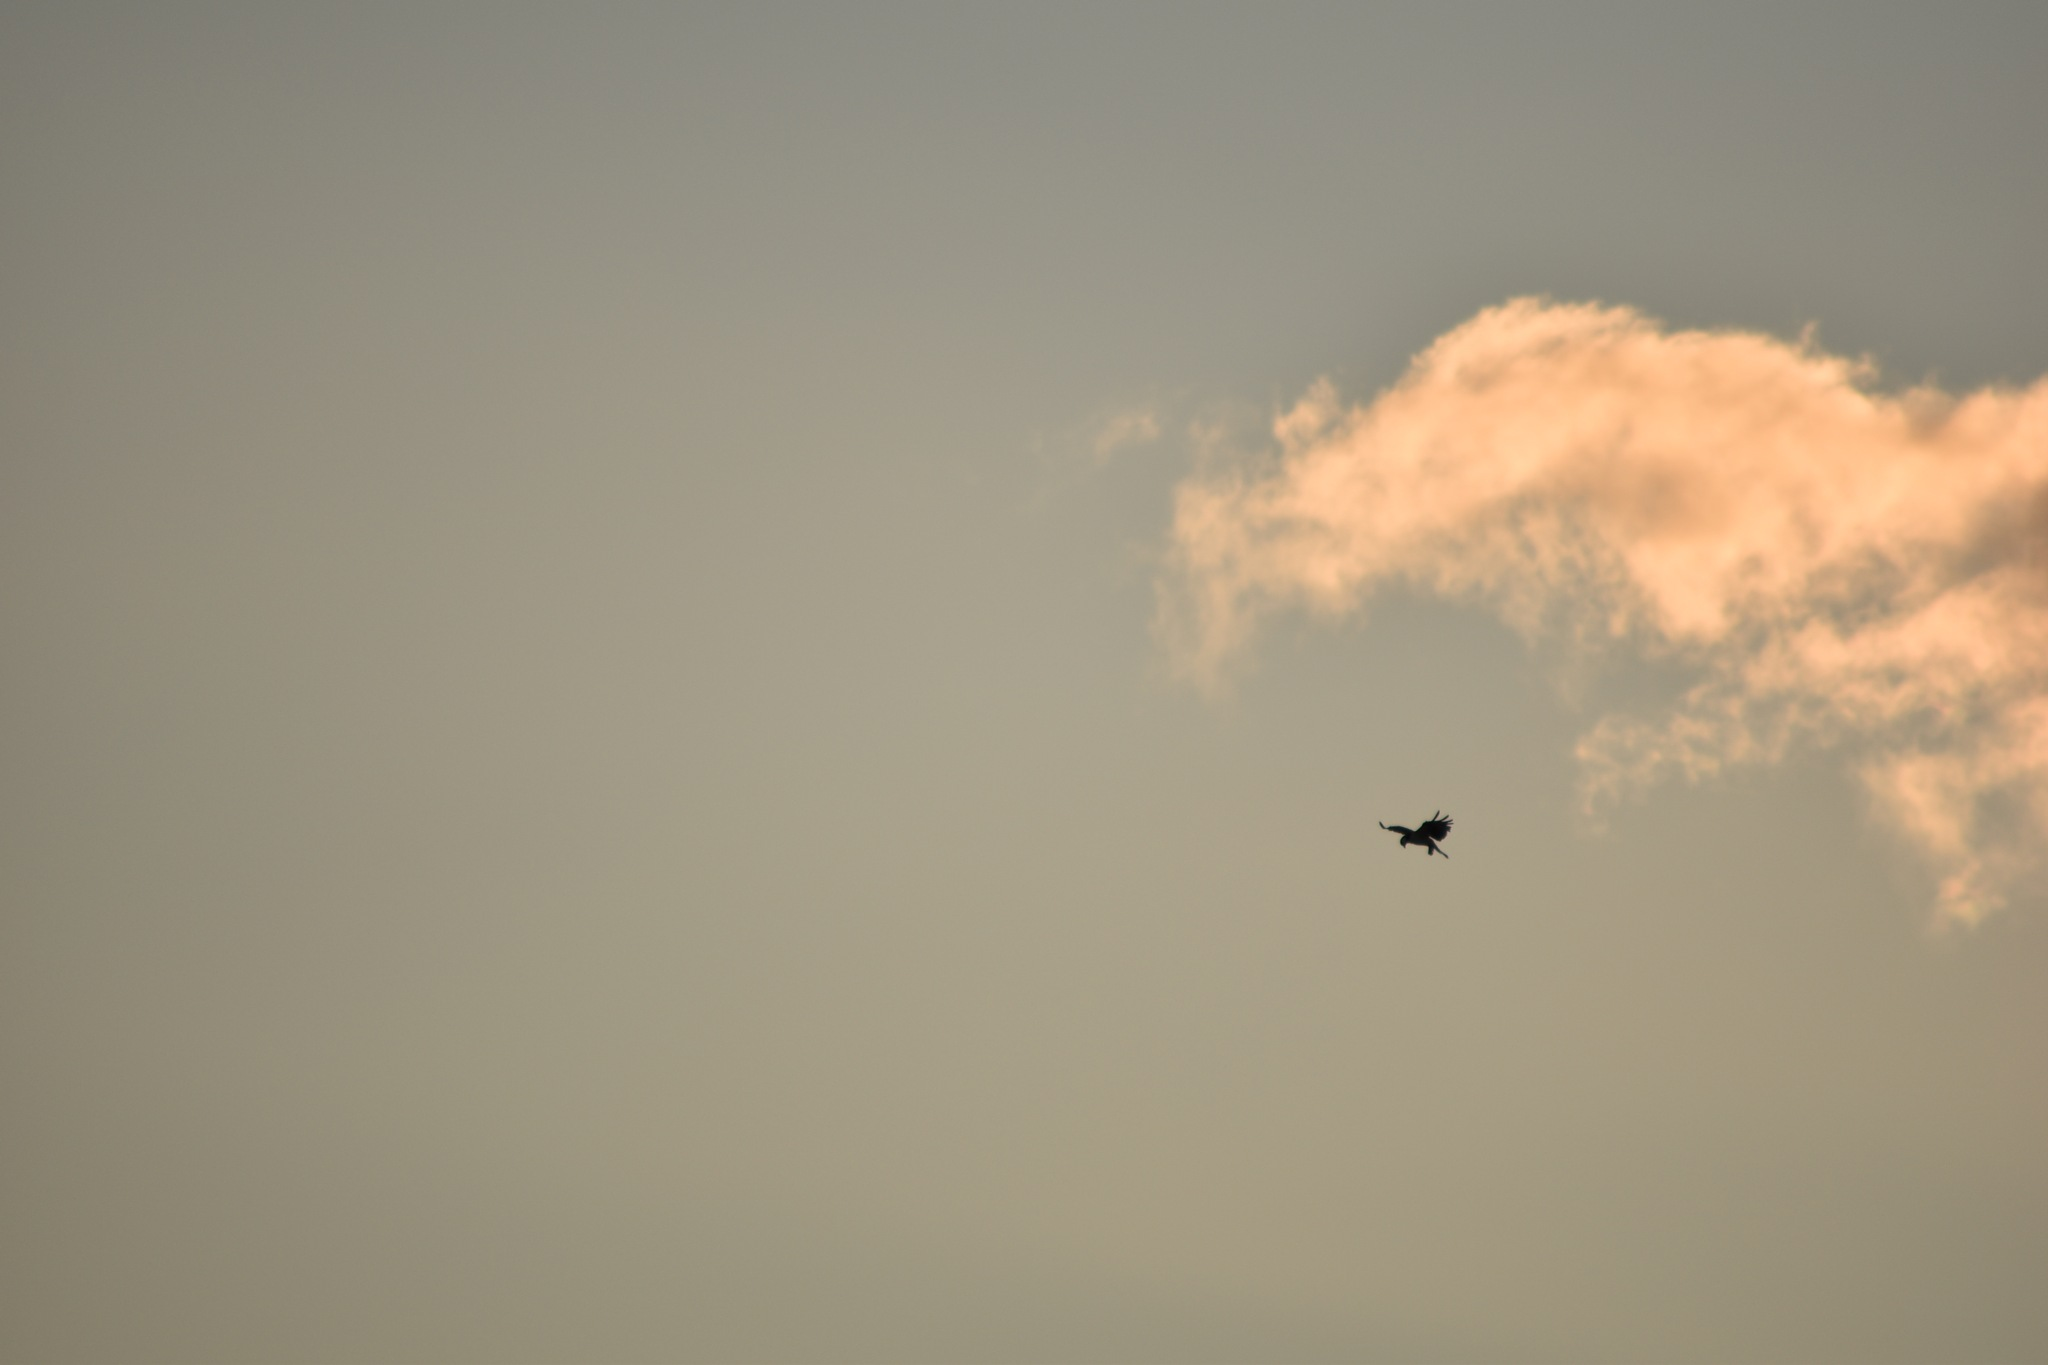 Cloud chasing bird by elevatedphotographymedia